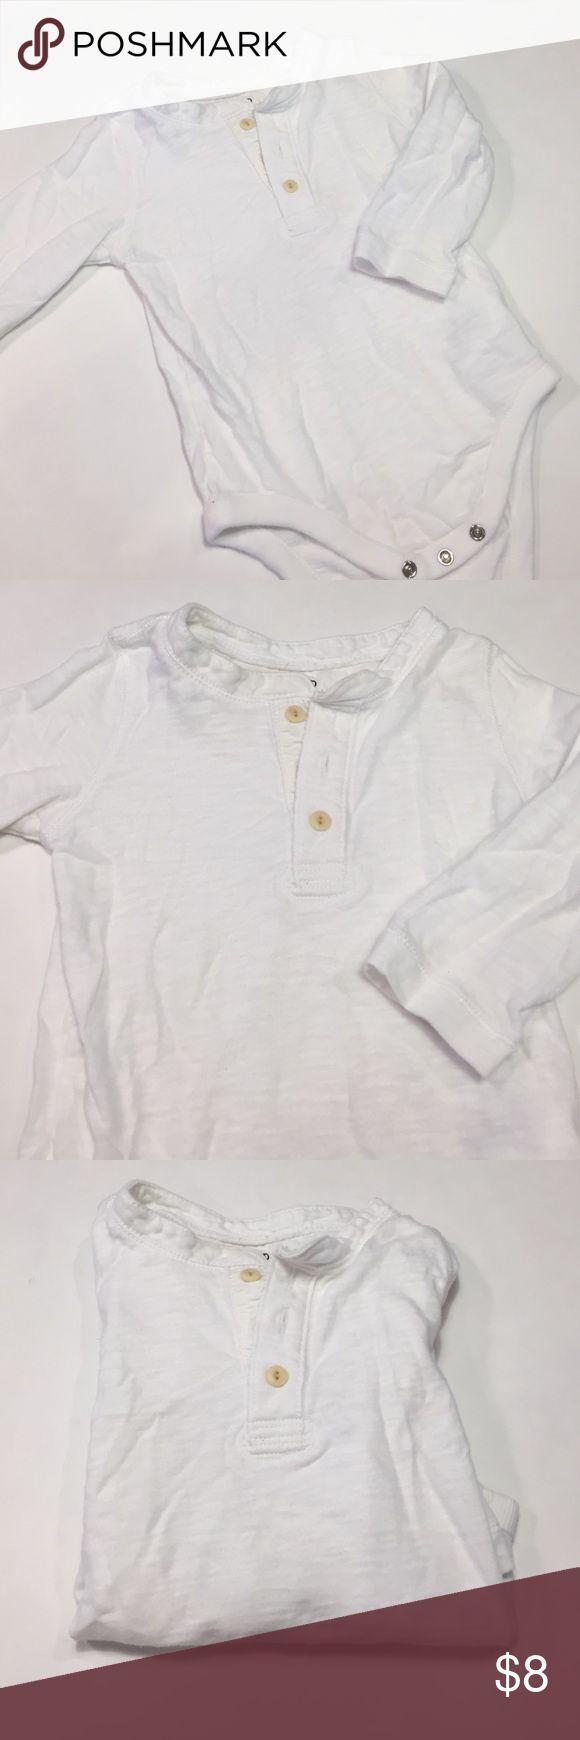 Gap baby white Henley top GUC Gap baby white Henley top GUC GAP Shirts & Tops Tees - Long Sleeve